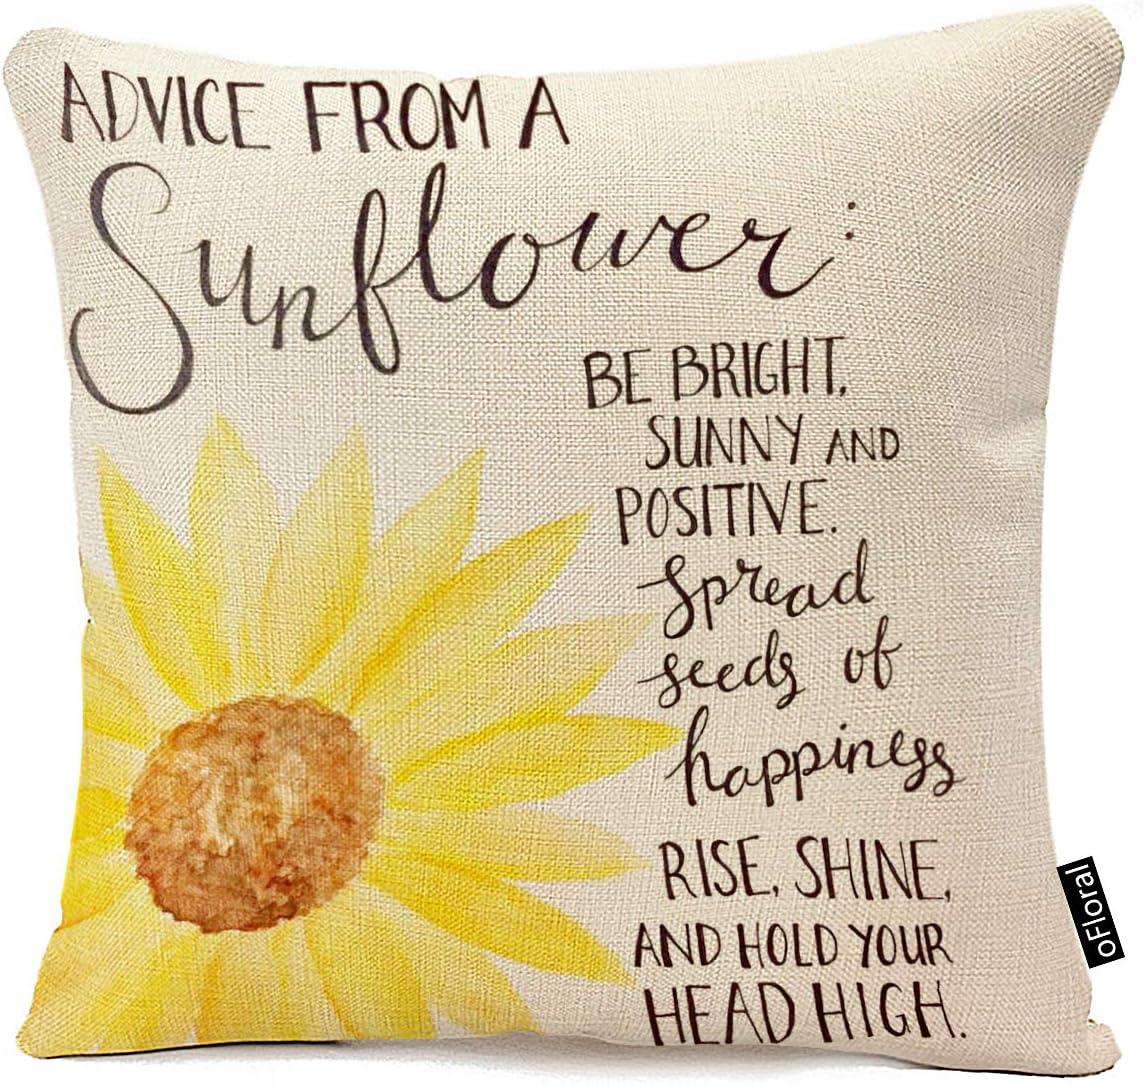 New Sunflower Polyester Cushion Cover Pillow Case Waist Throw Home Sofe Decor 18